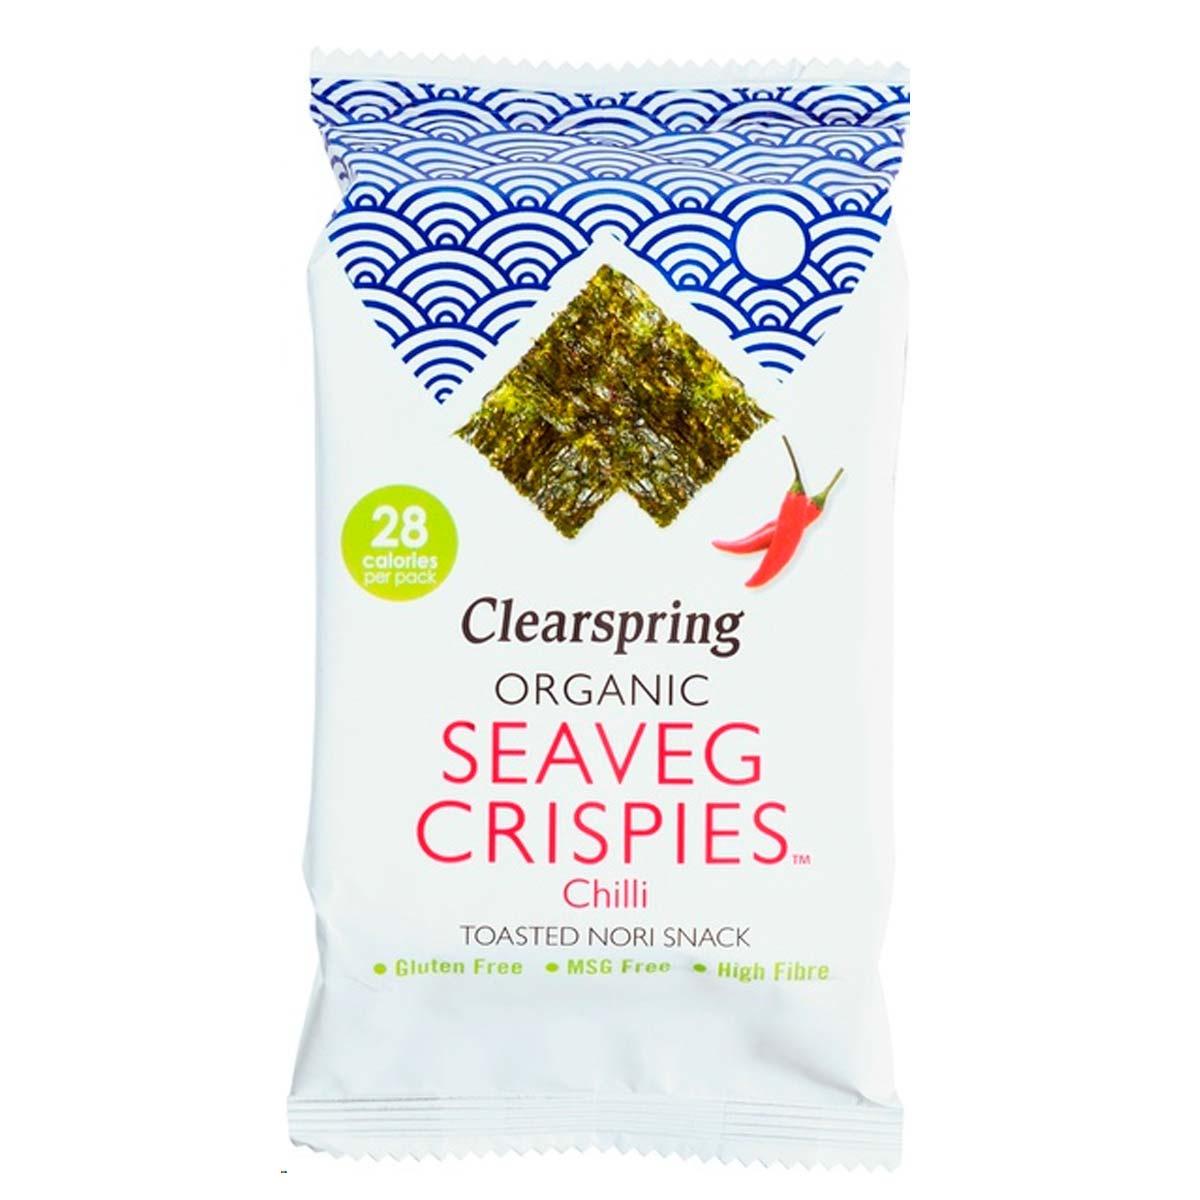 seaveg crispies chilli nori snack Biologisch